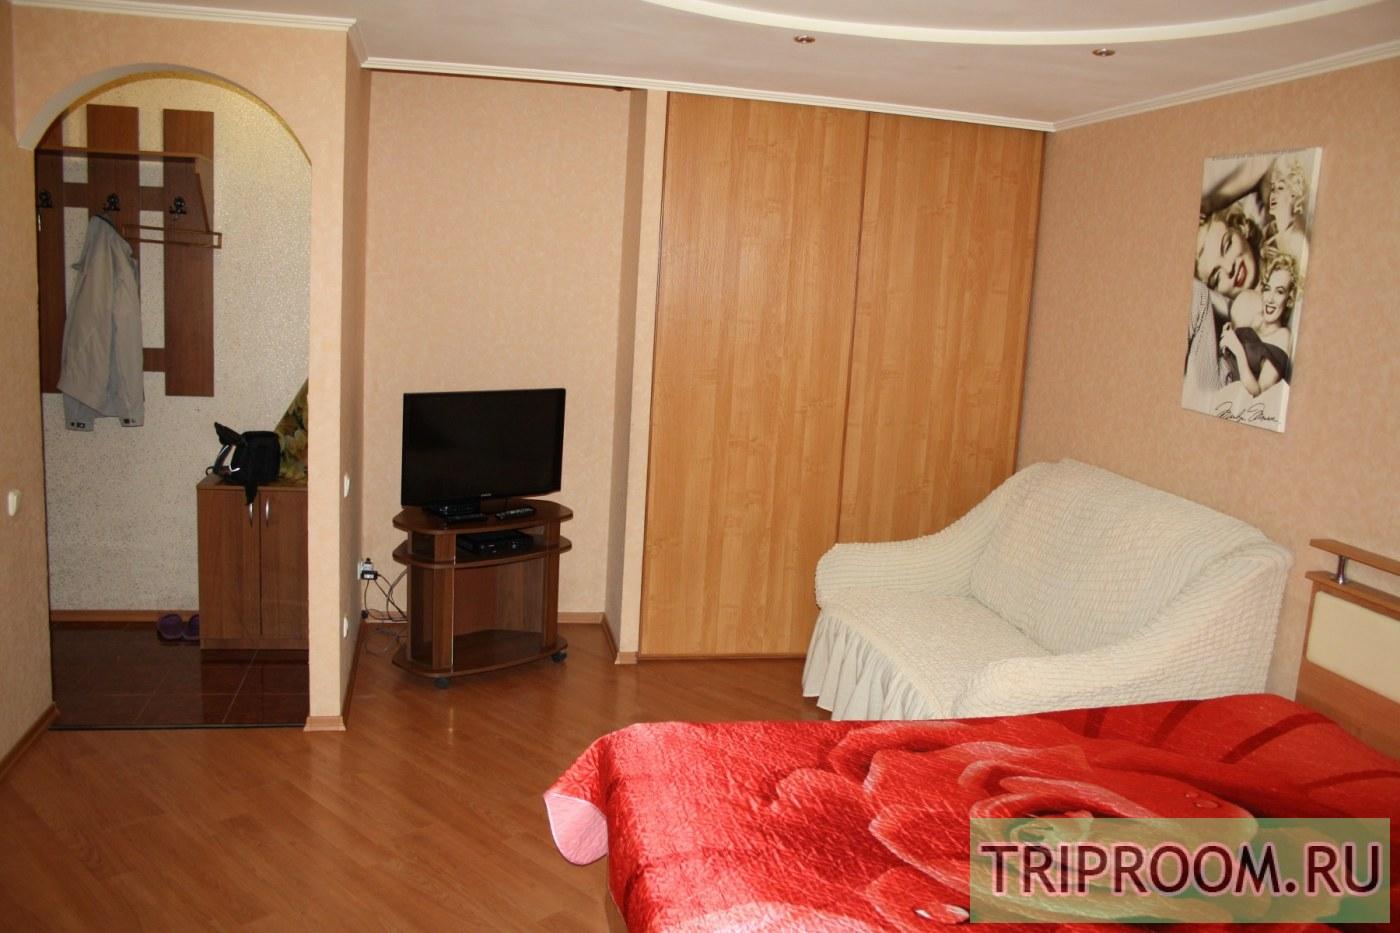 1-комнатная квартира посуточно (вариант № 39644), ул. Ипподромная улица, фото № 4